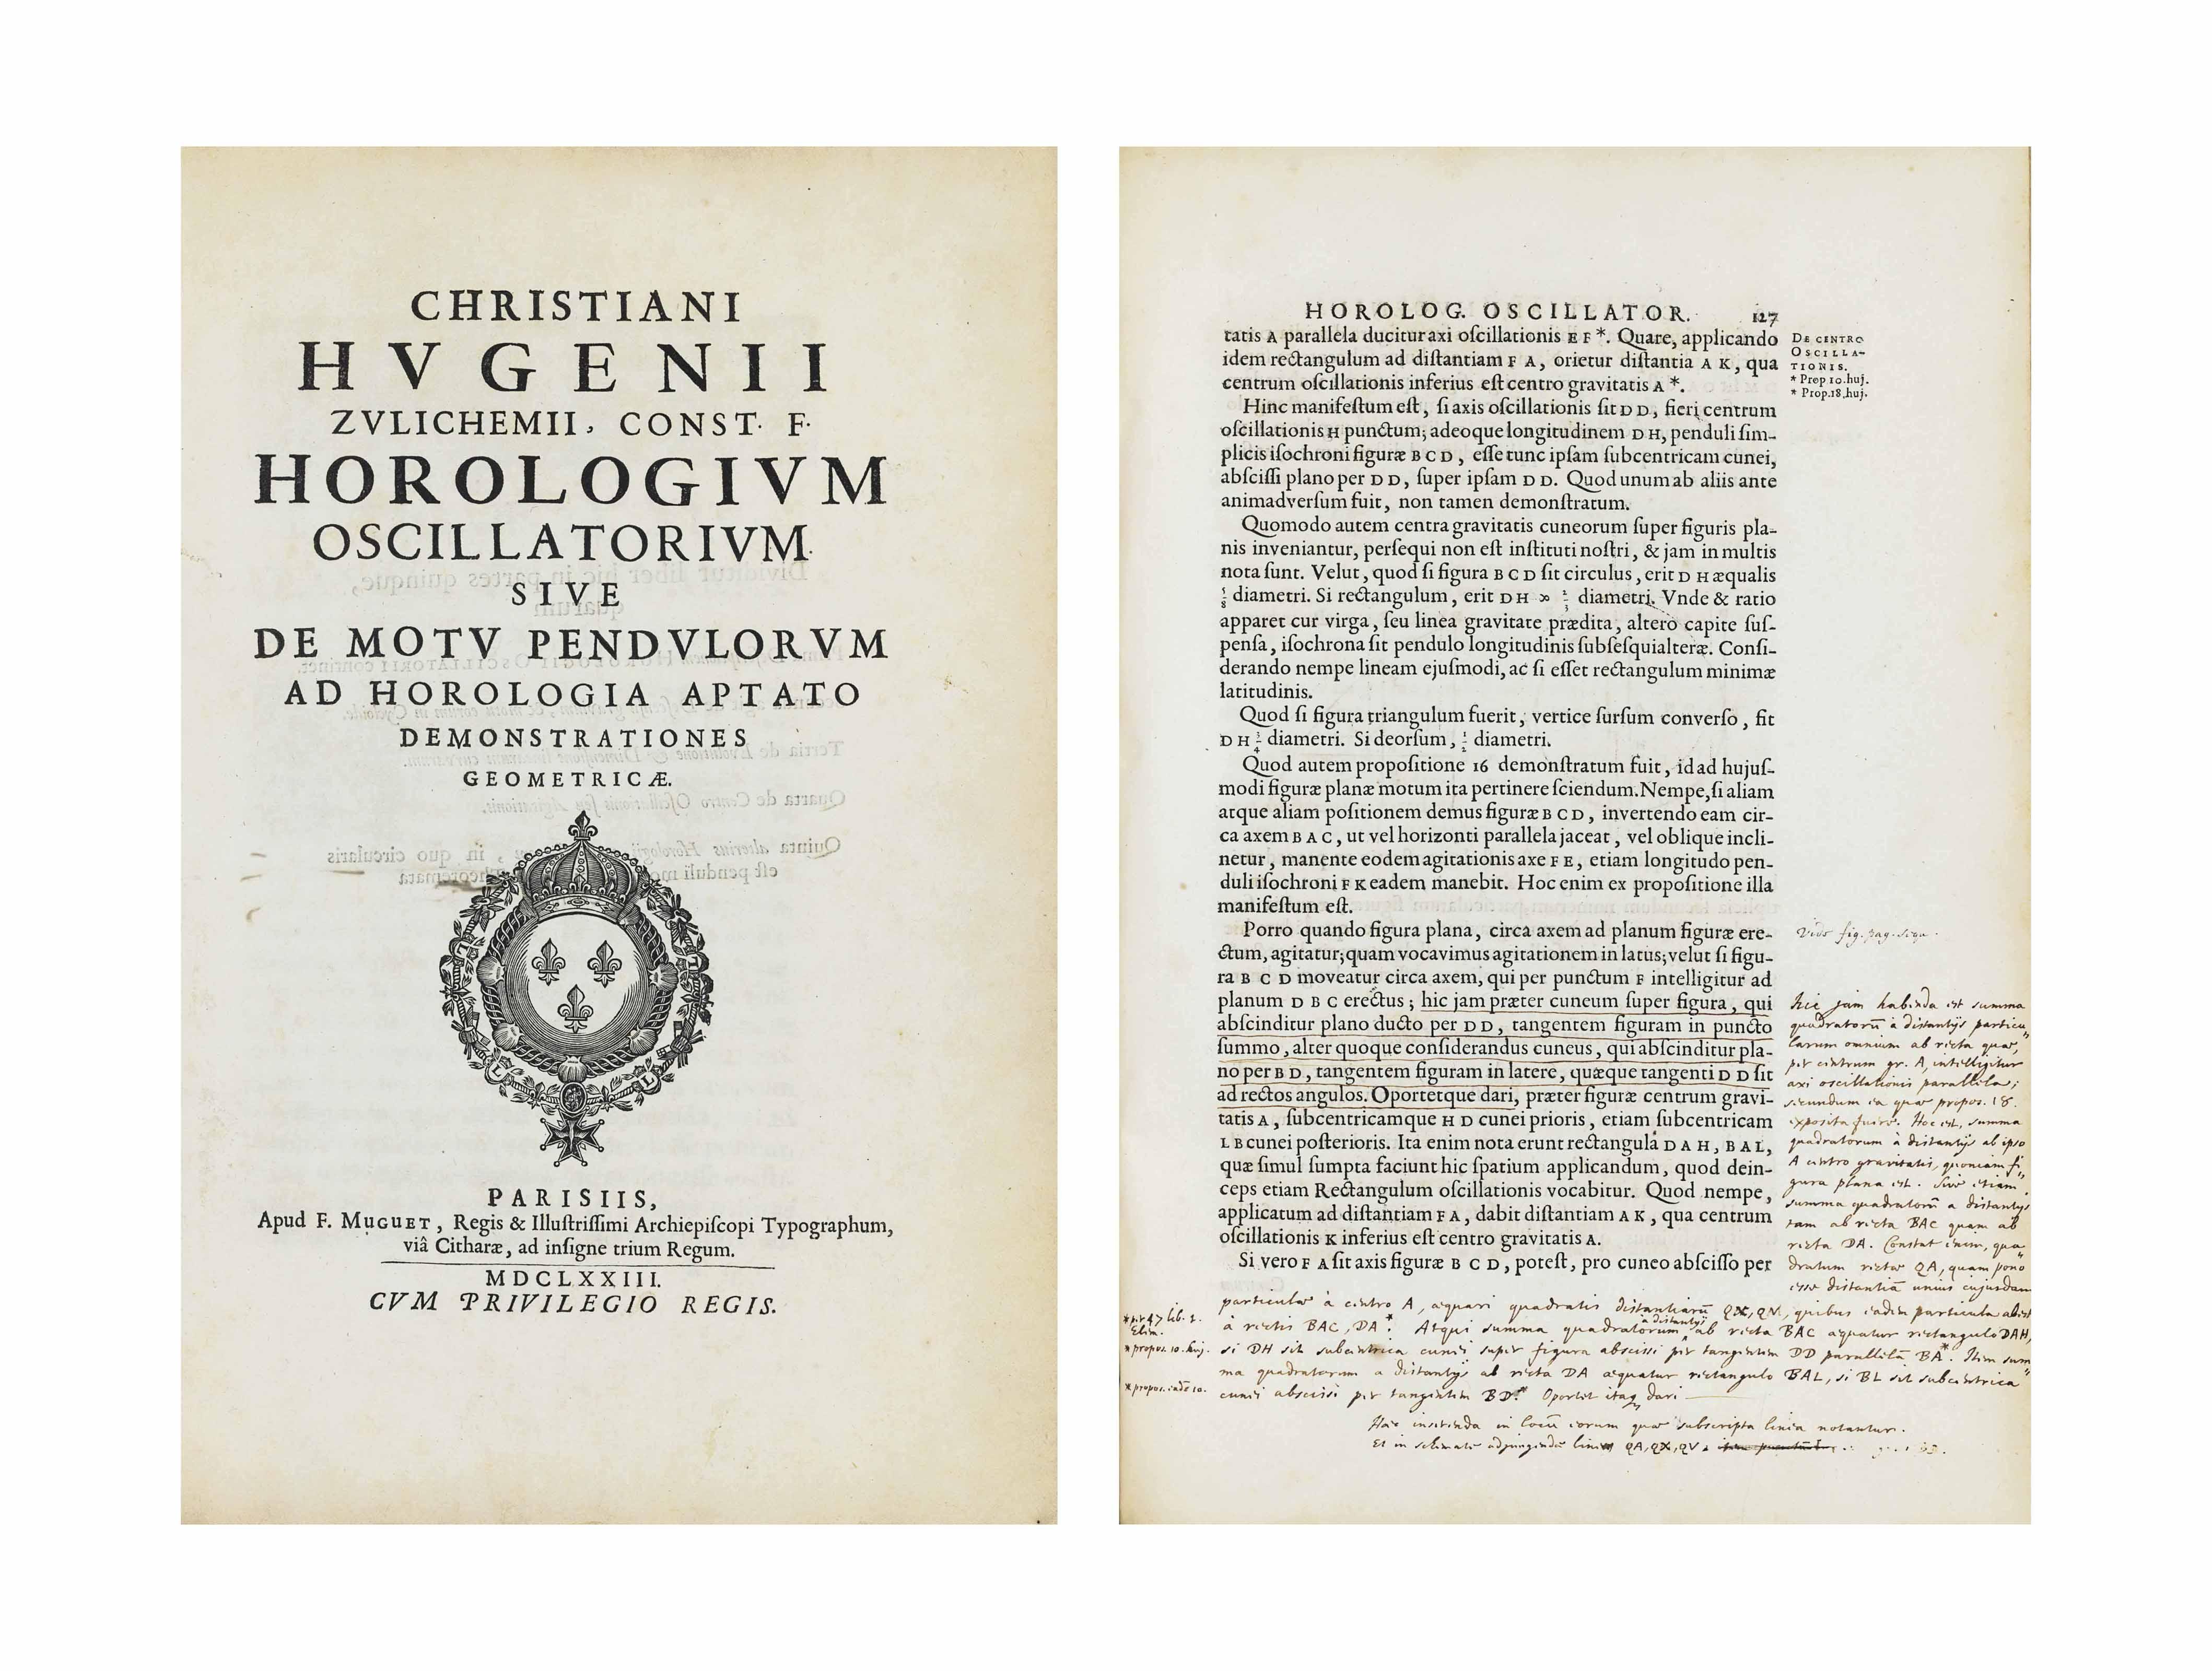 HUYGENS, Christiaan (1629-1695). Horologium oscillatorium sive de motu pendulorum ad horologia aptato demonstrationes geometricae. Paris: F. Muguet, 1673.